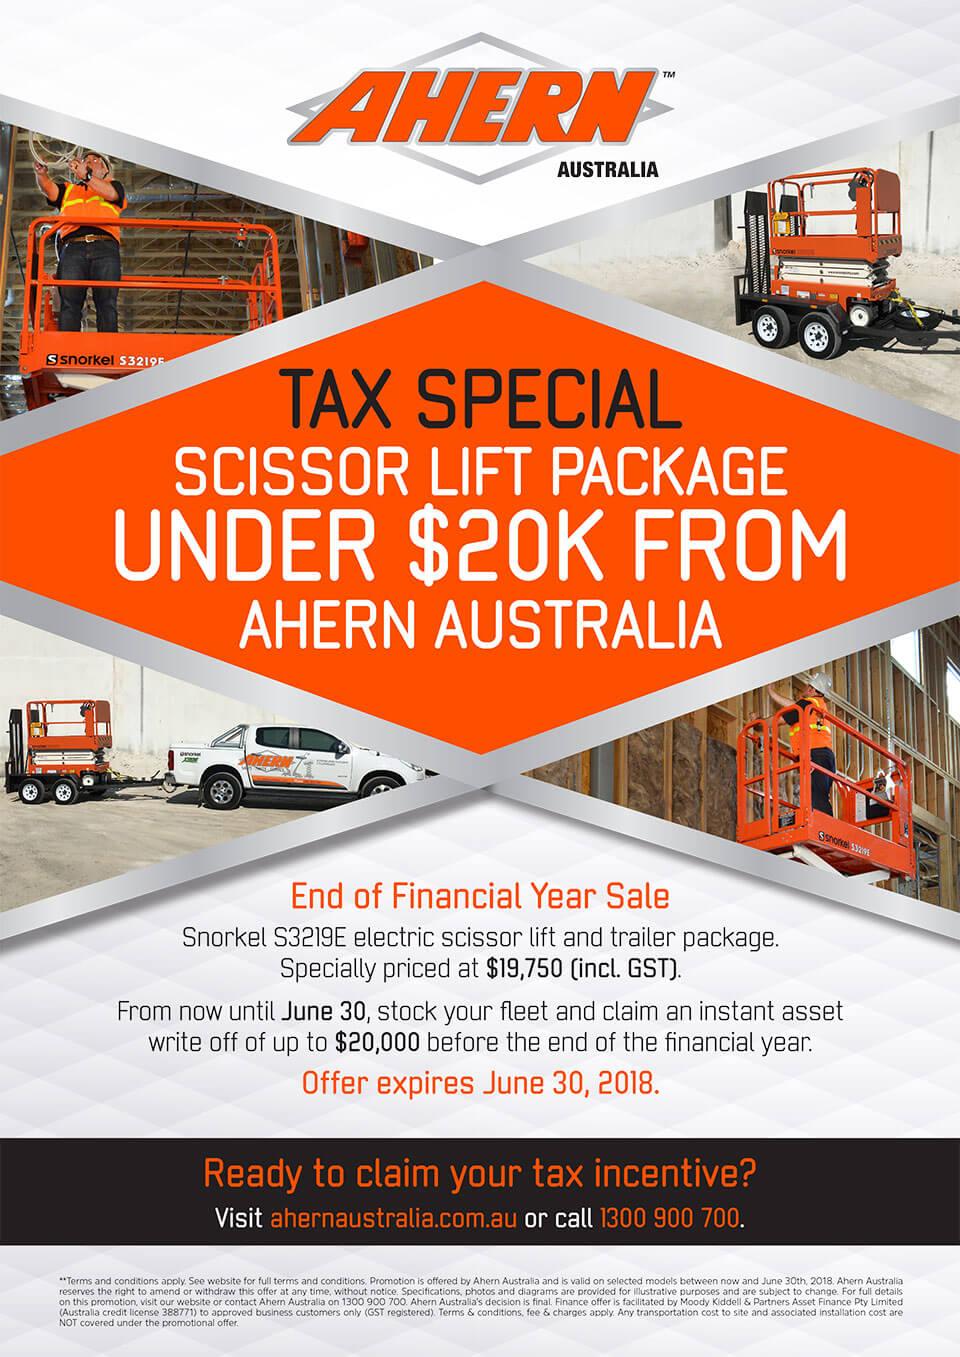 Tax Special: Scissor Lift Package